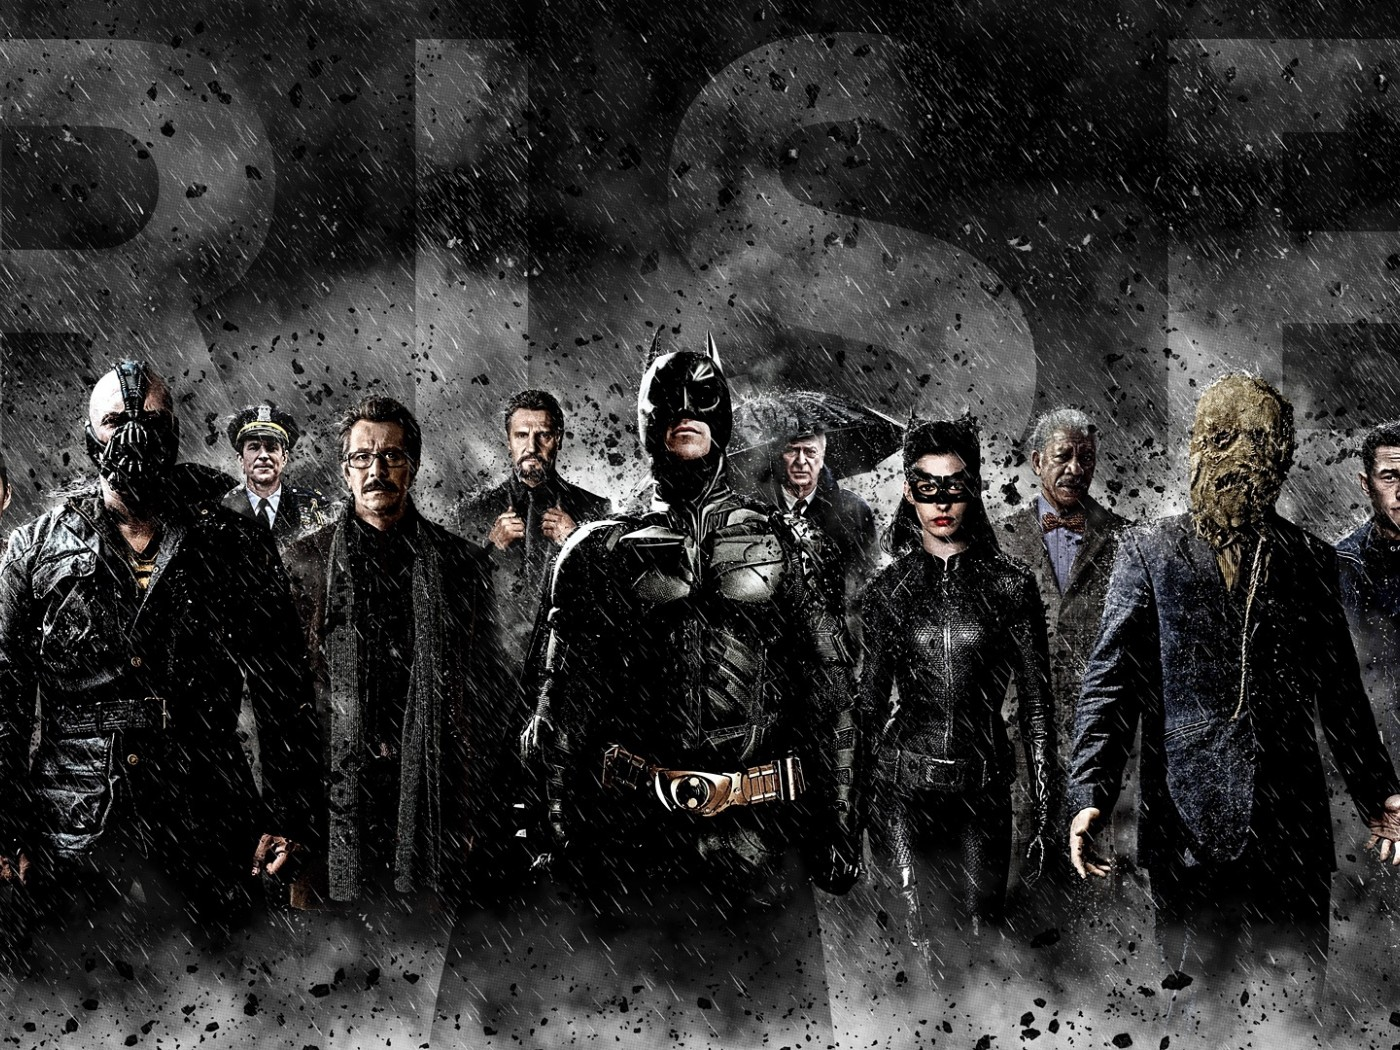 Tom Hardy Wallpaper Entitled The Dark Knight Rises Bane